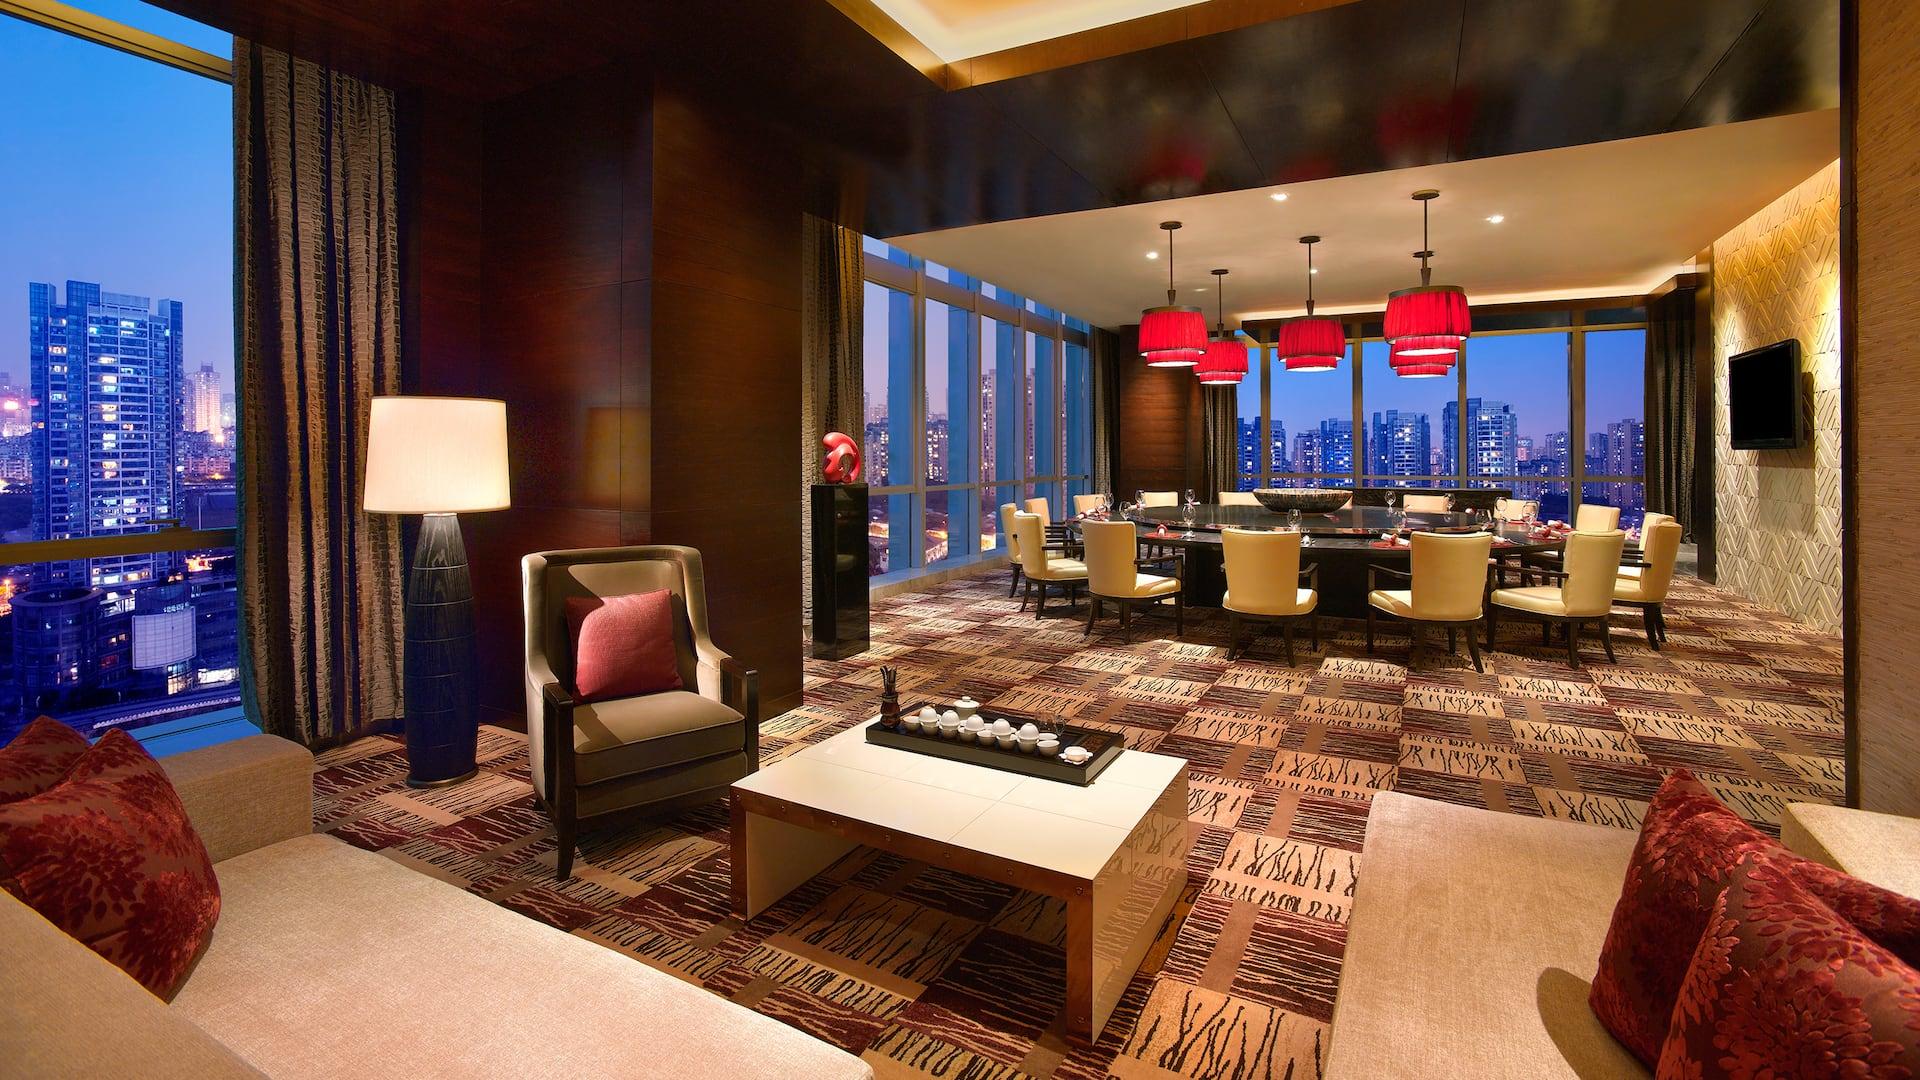 Hyatt Regency Chongqing Private Dining Room